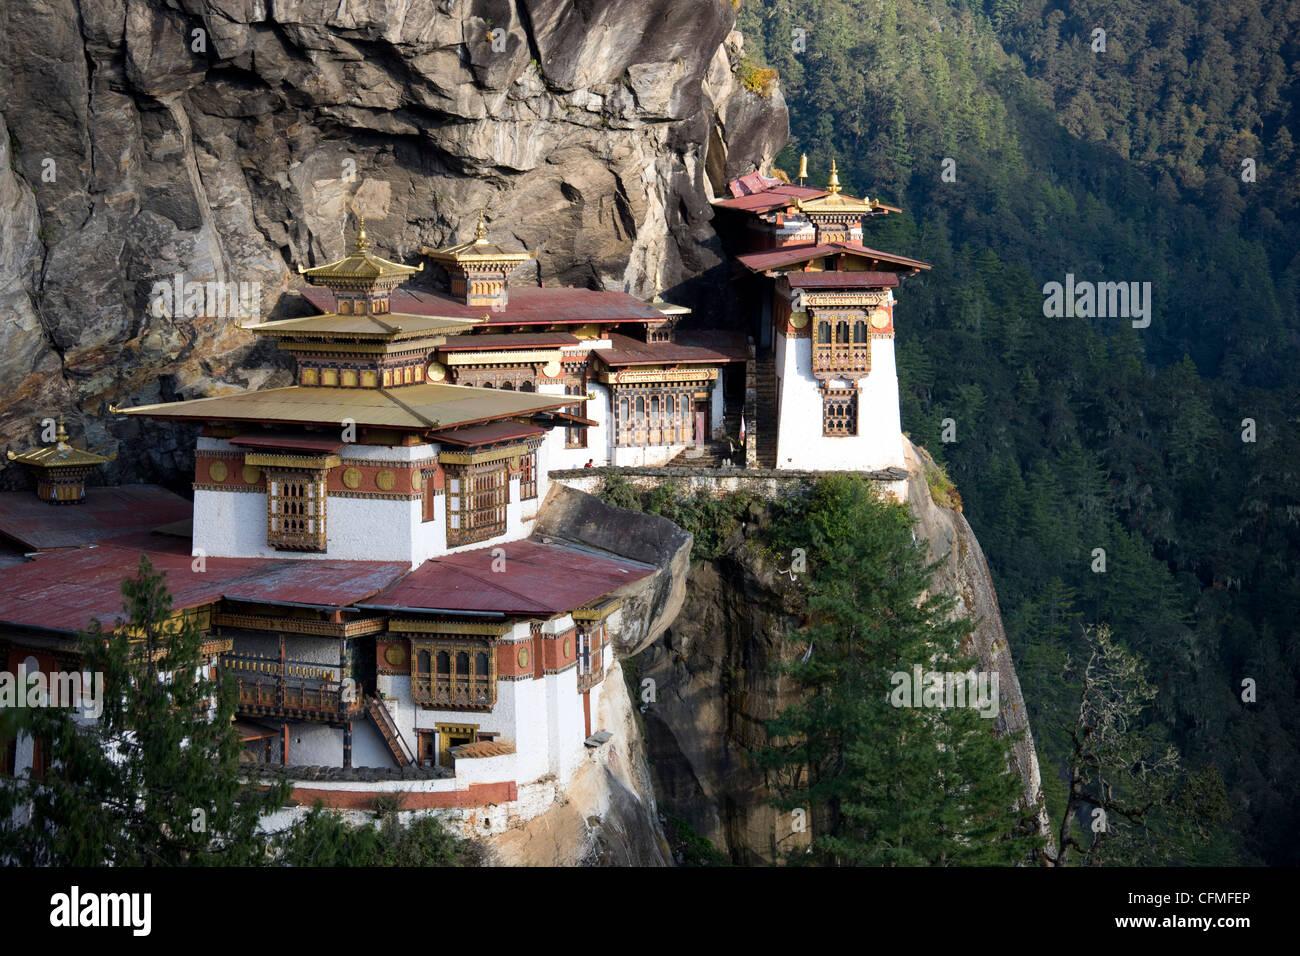 Taktshang Goemba (Tiger Nest Kloster), Paro-Tal, Bhutan, Asien Stockfoto